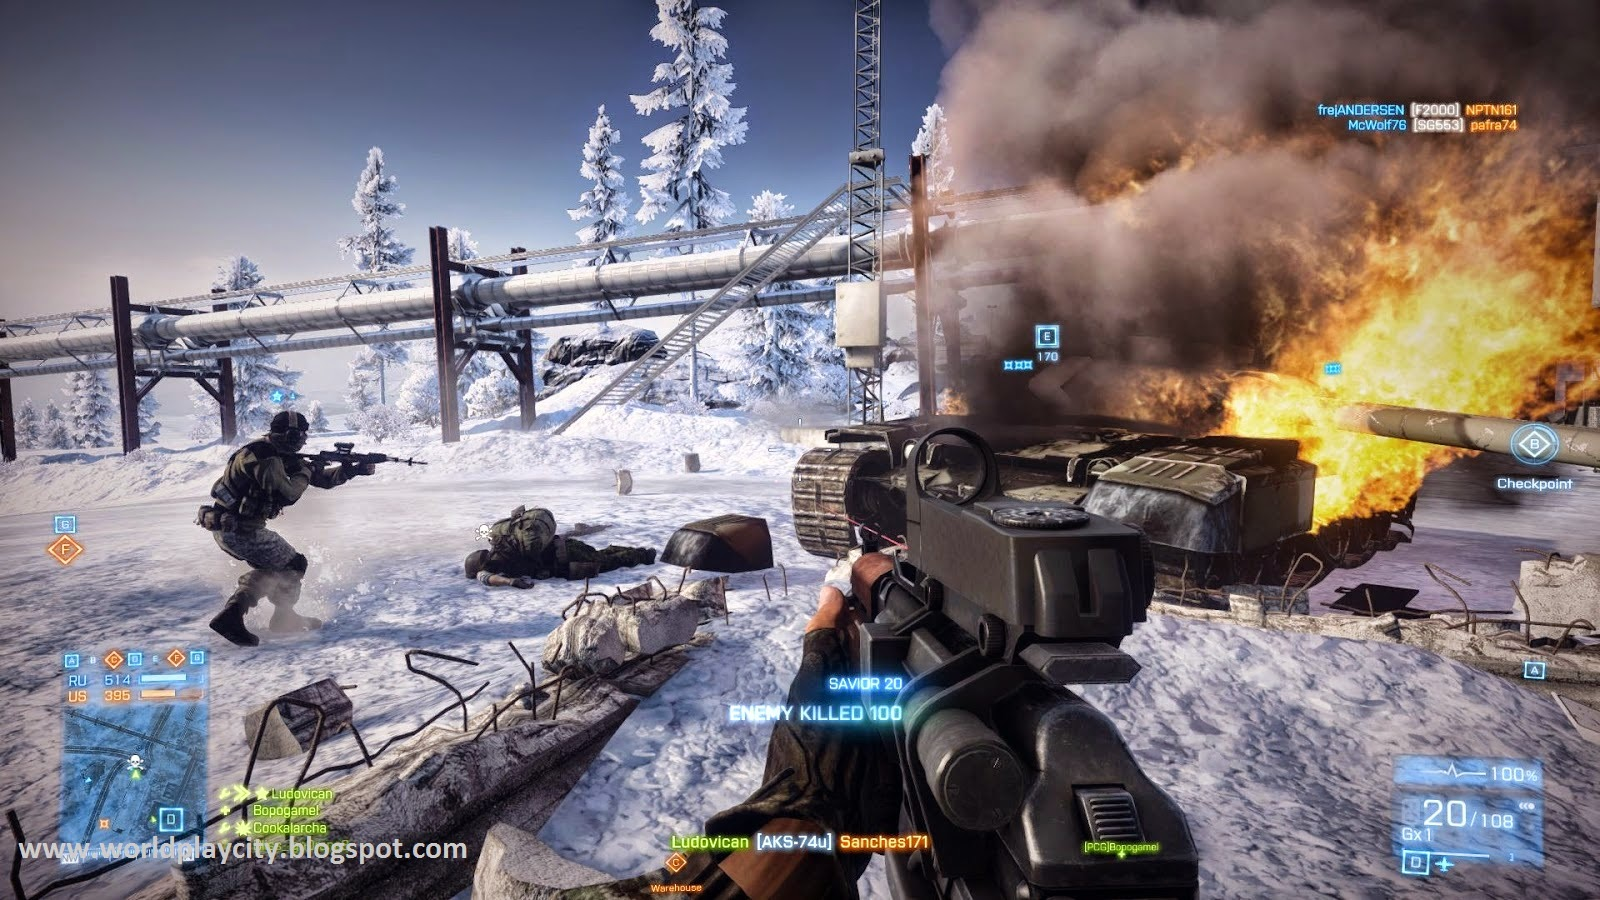 battlefield 4 game full version download free